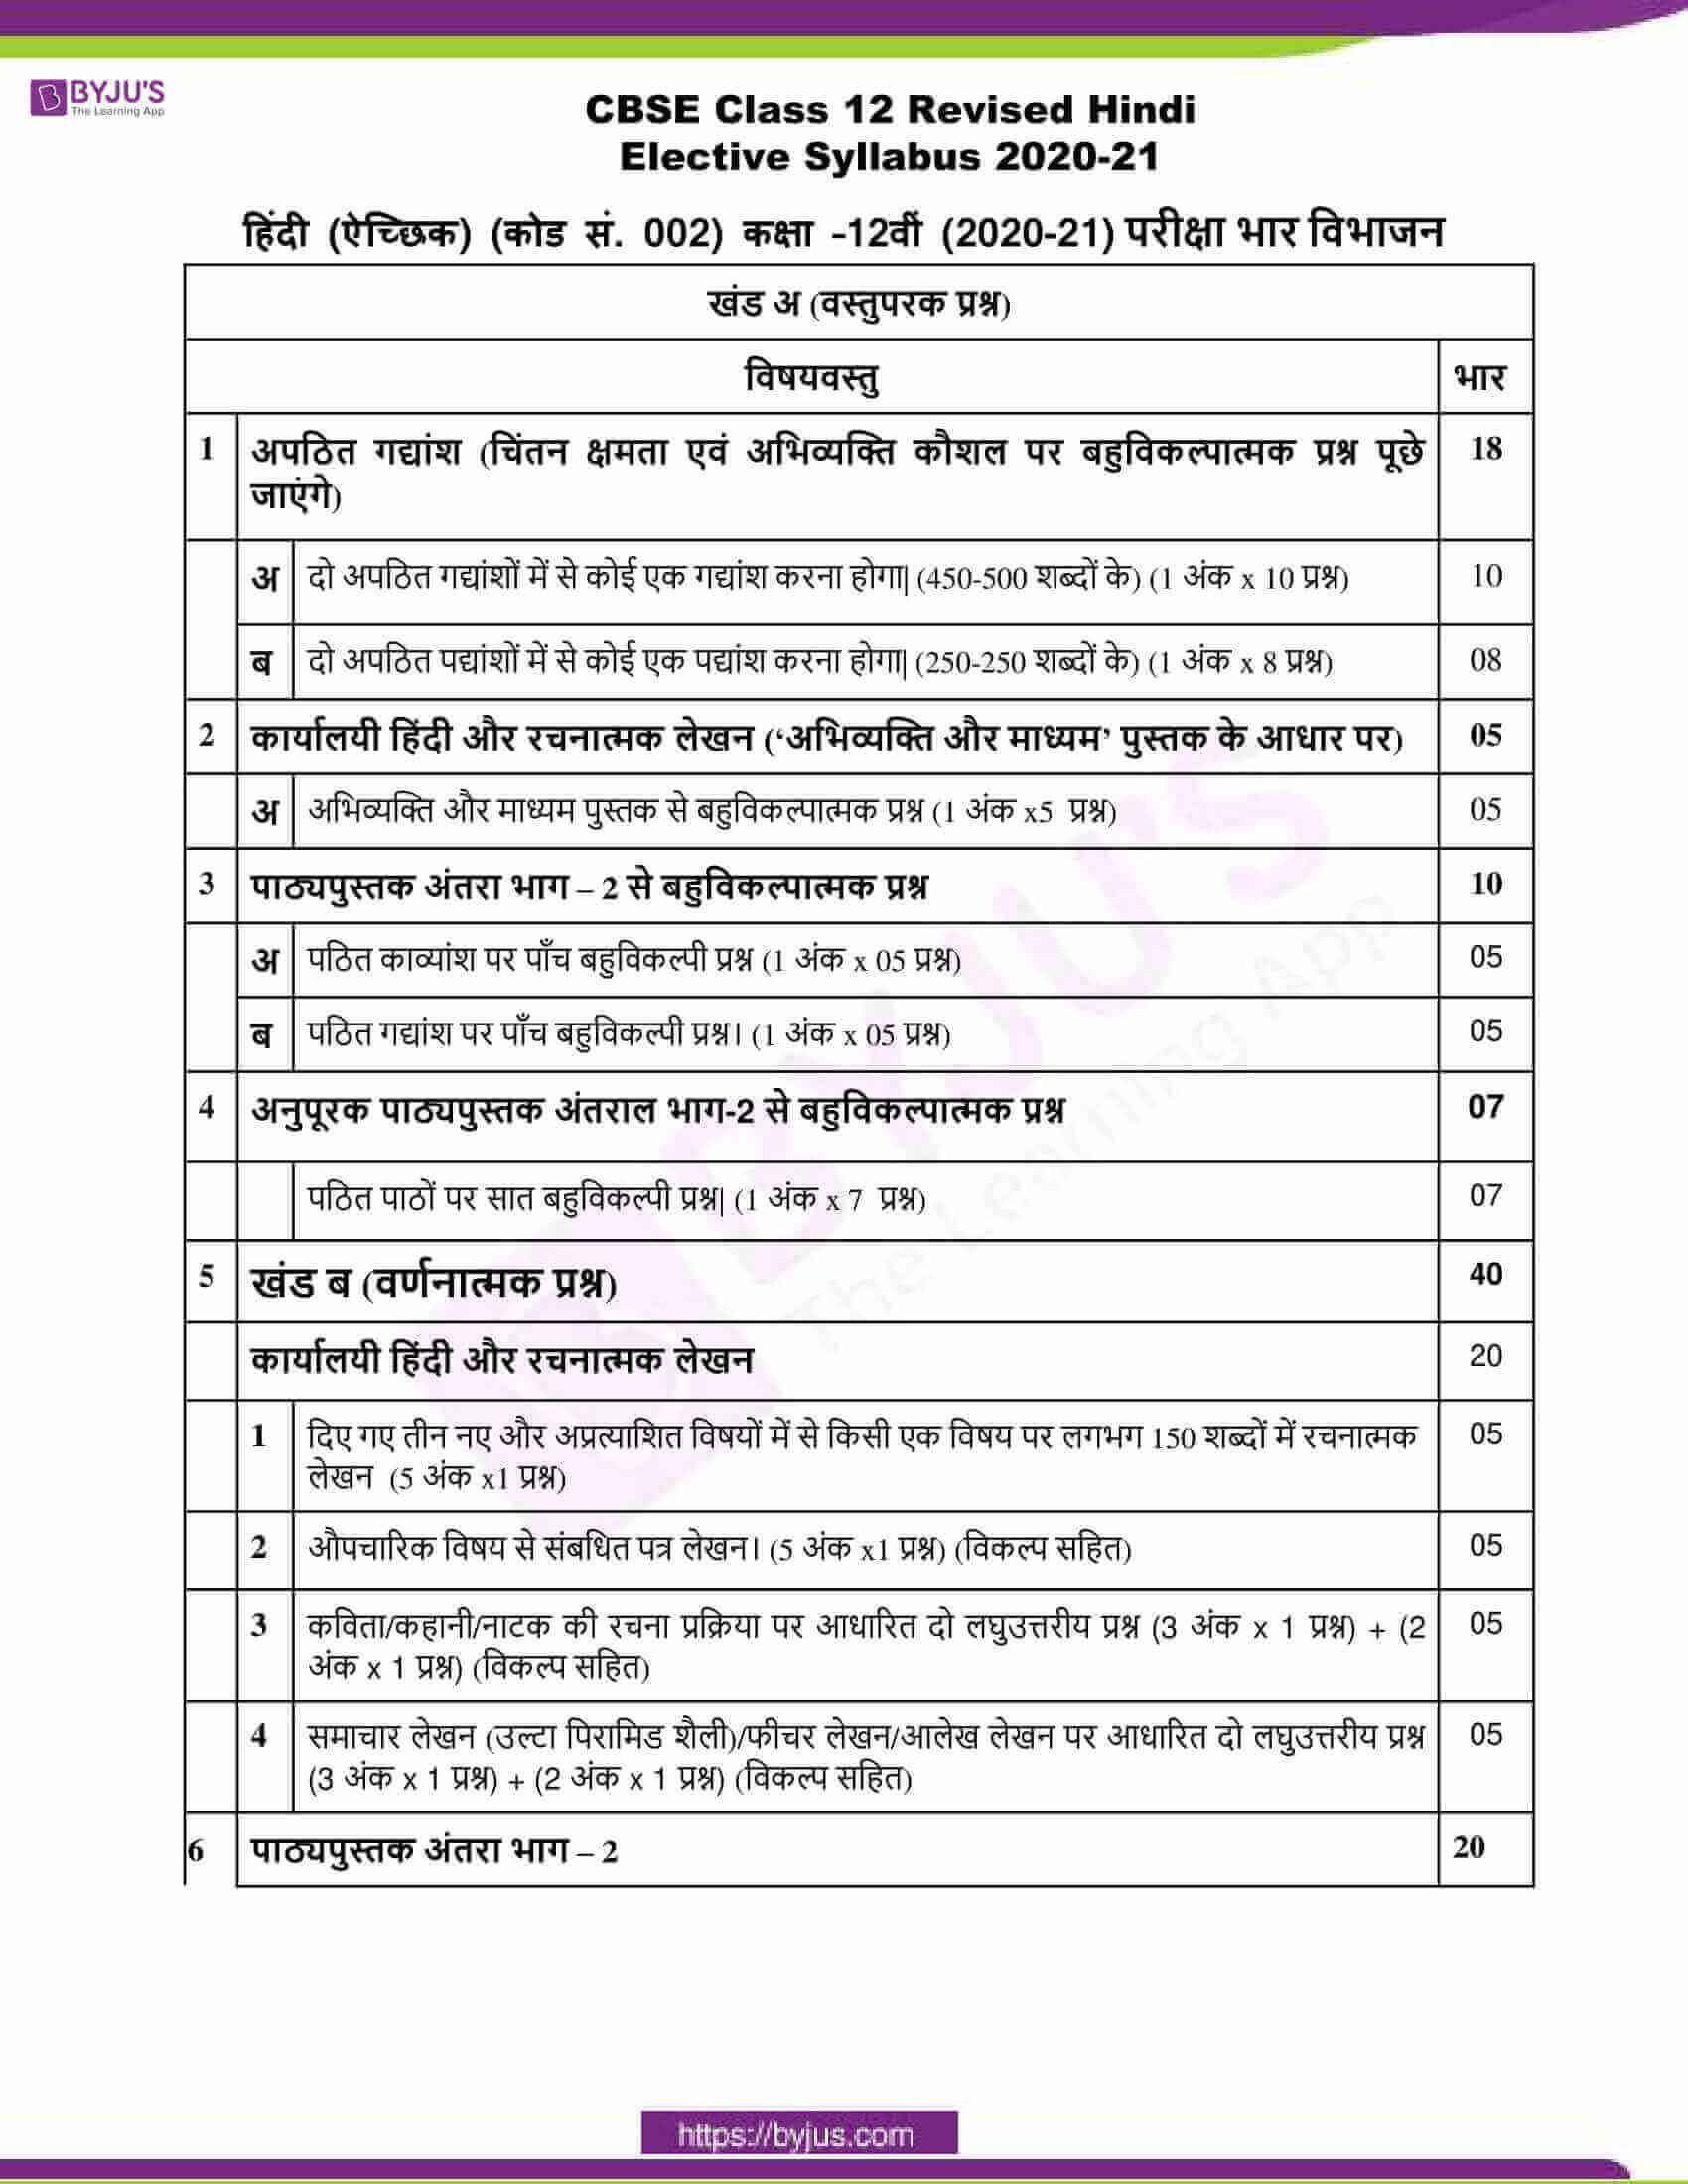 cbse class 12 hindi elective syllabus 2020 21 1